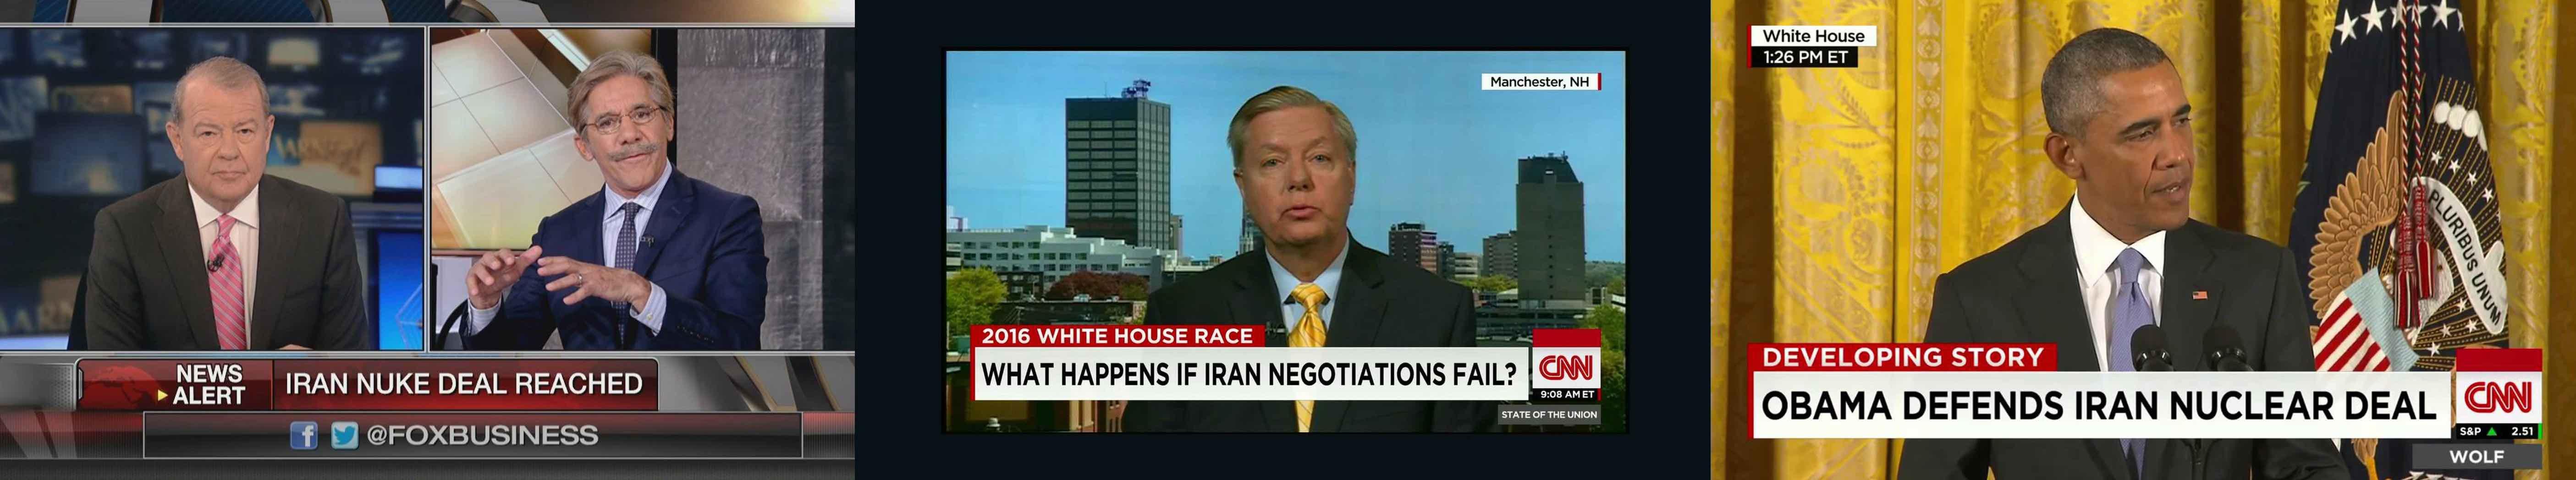 FoxNews CNN MSNBC Headline - compressed